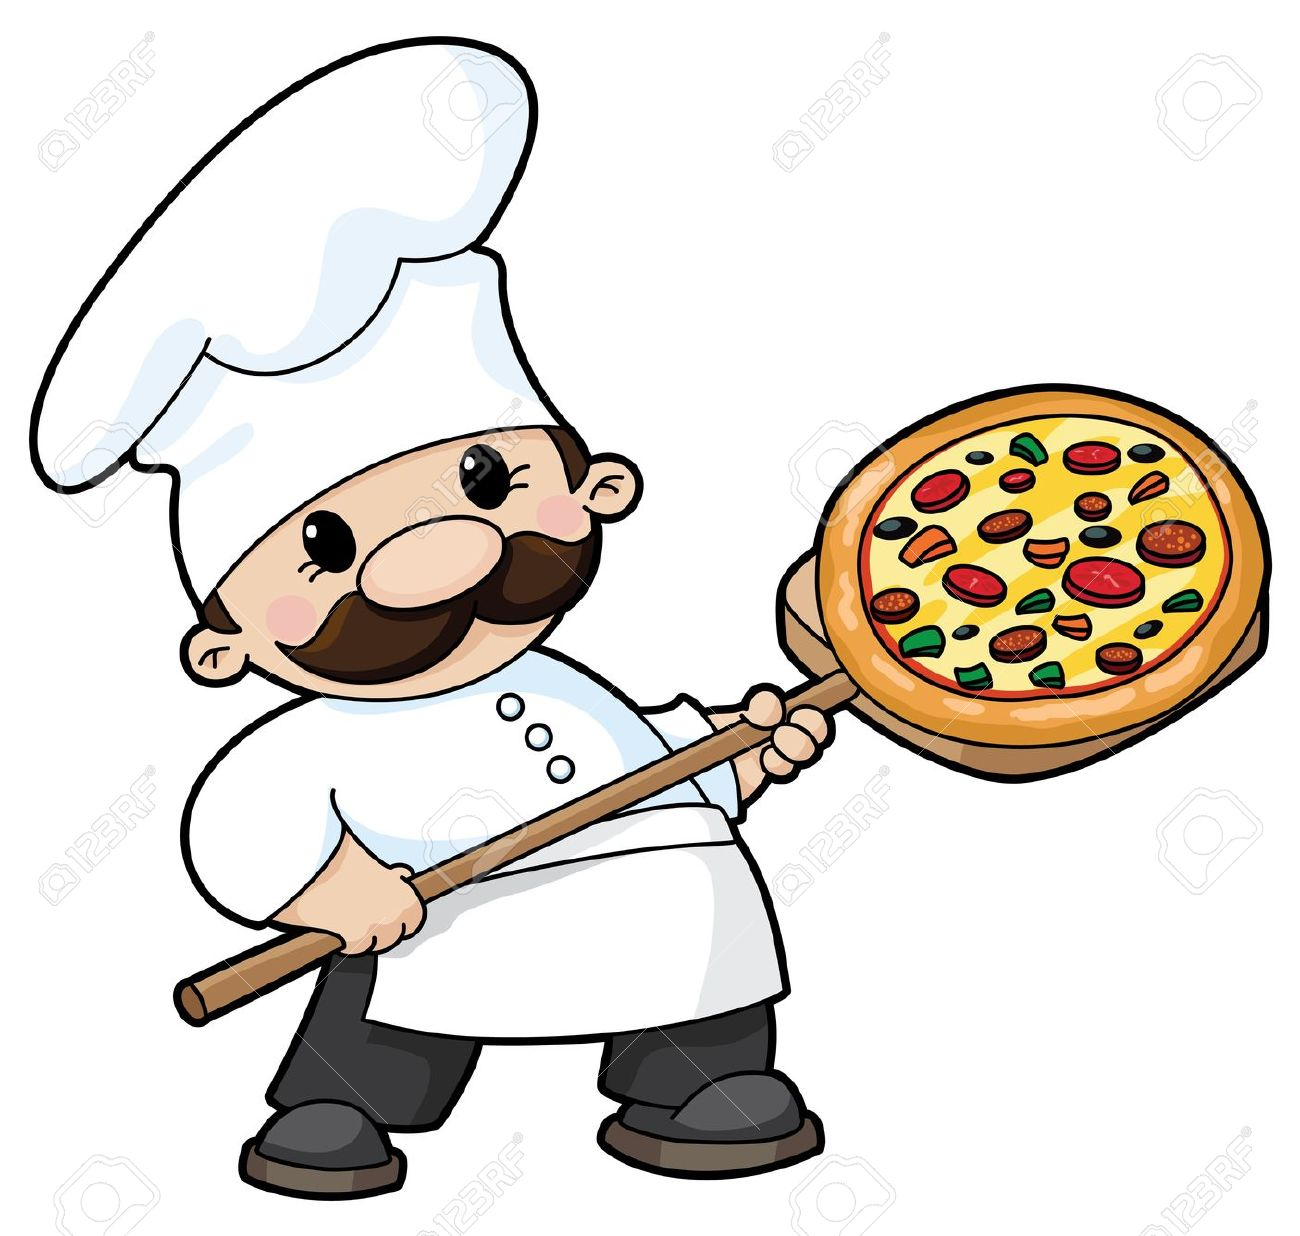 1300x1236 Pizza Clipart Pizza Boy